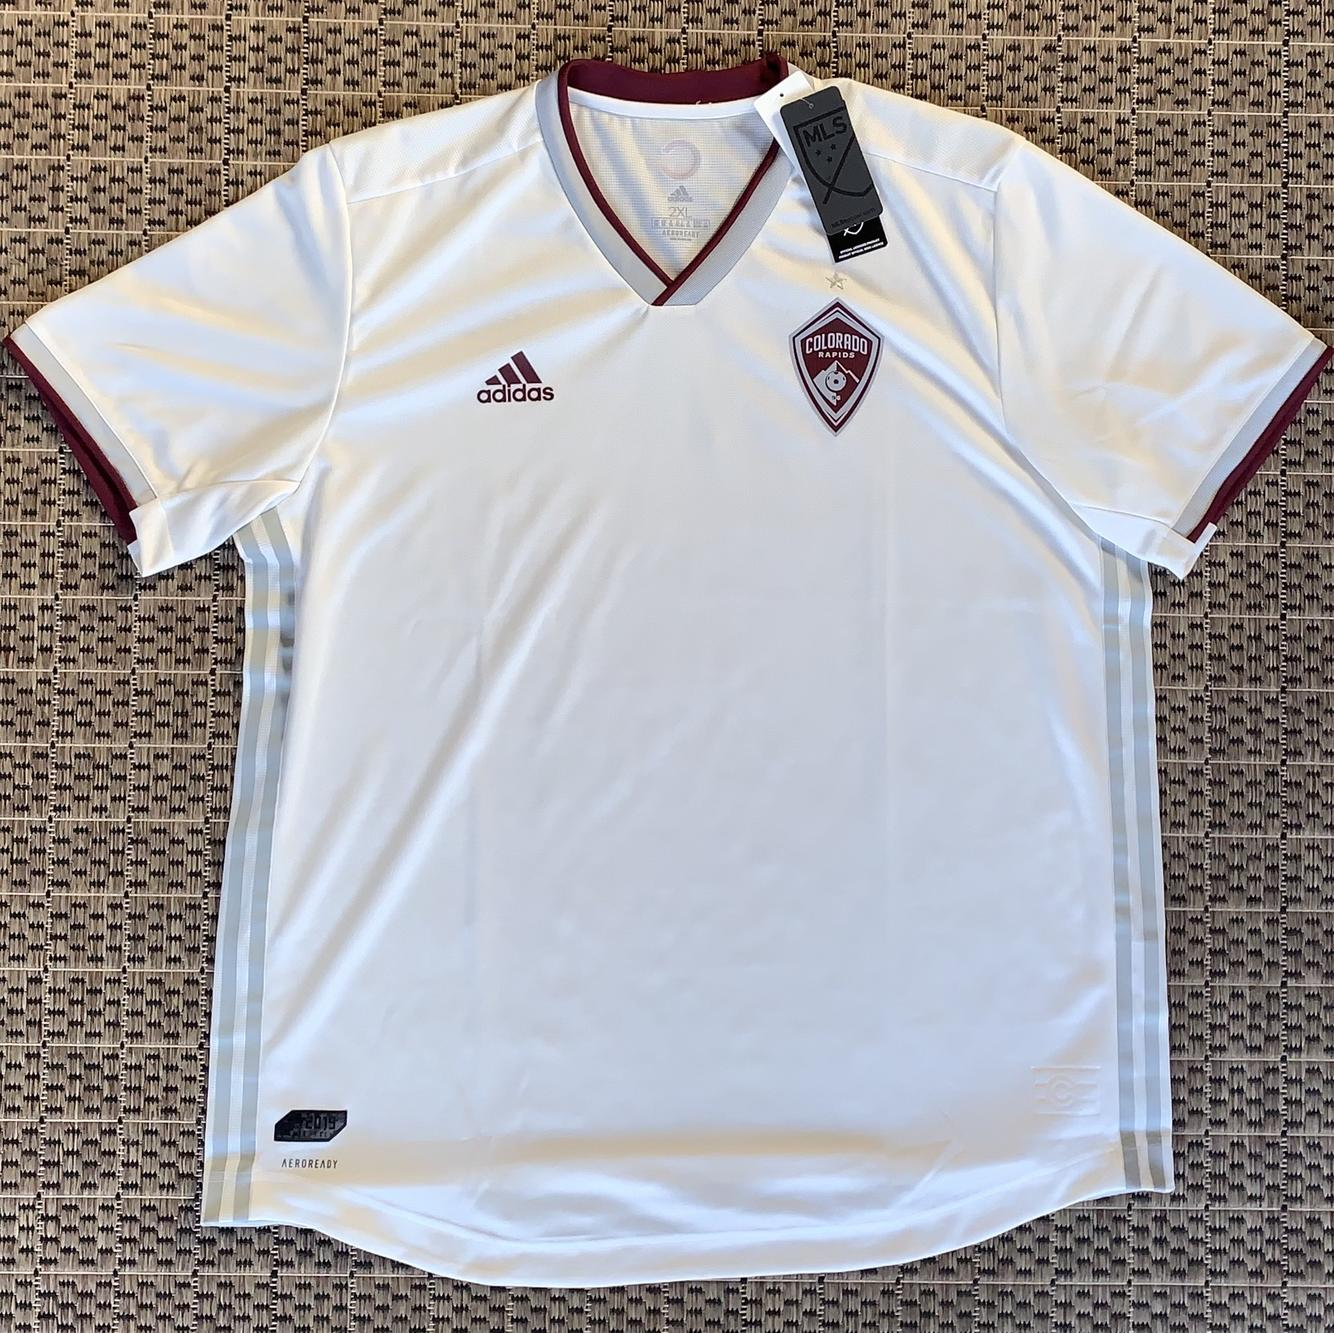 White New XXL Adidas Jersey